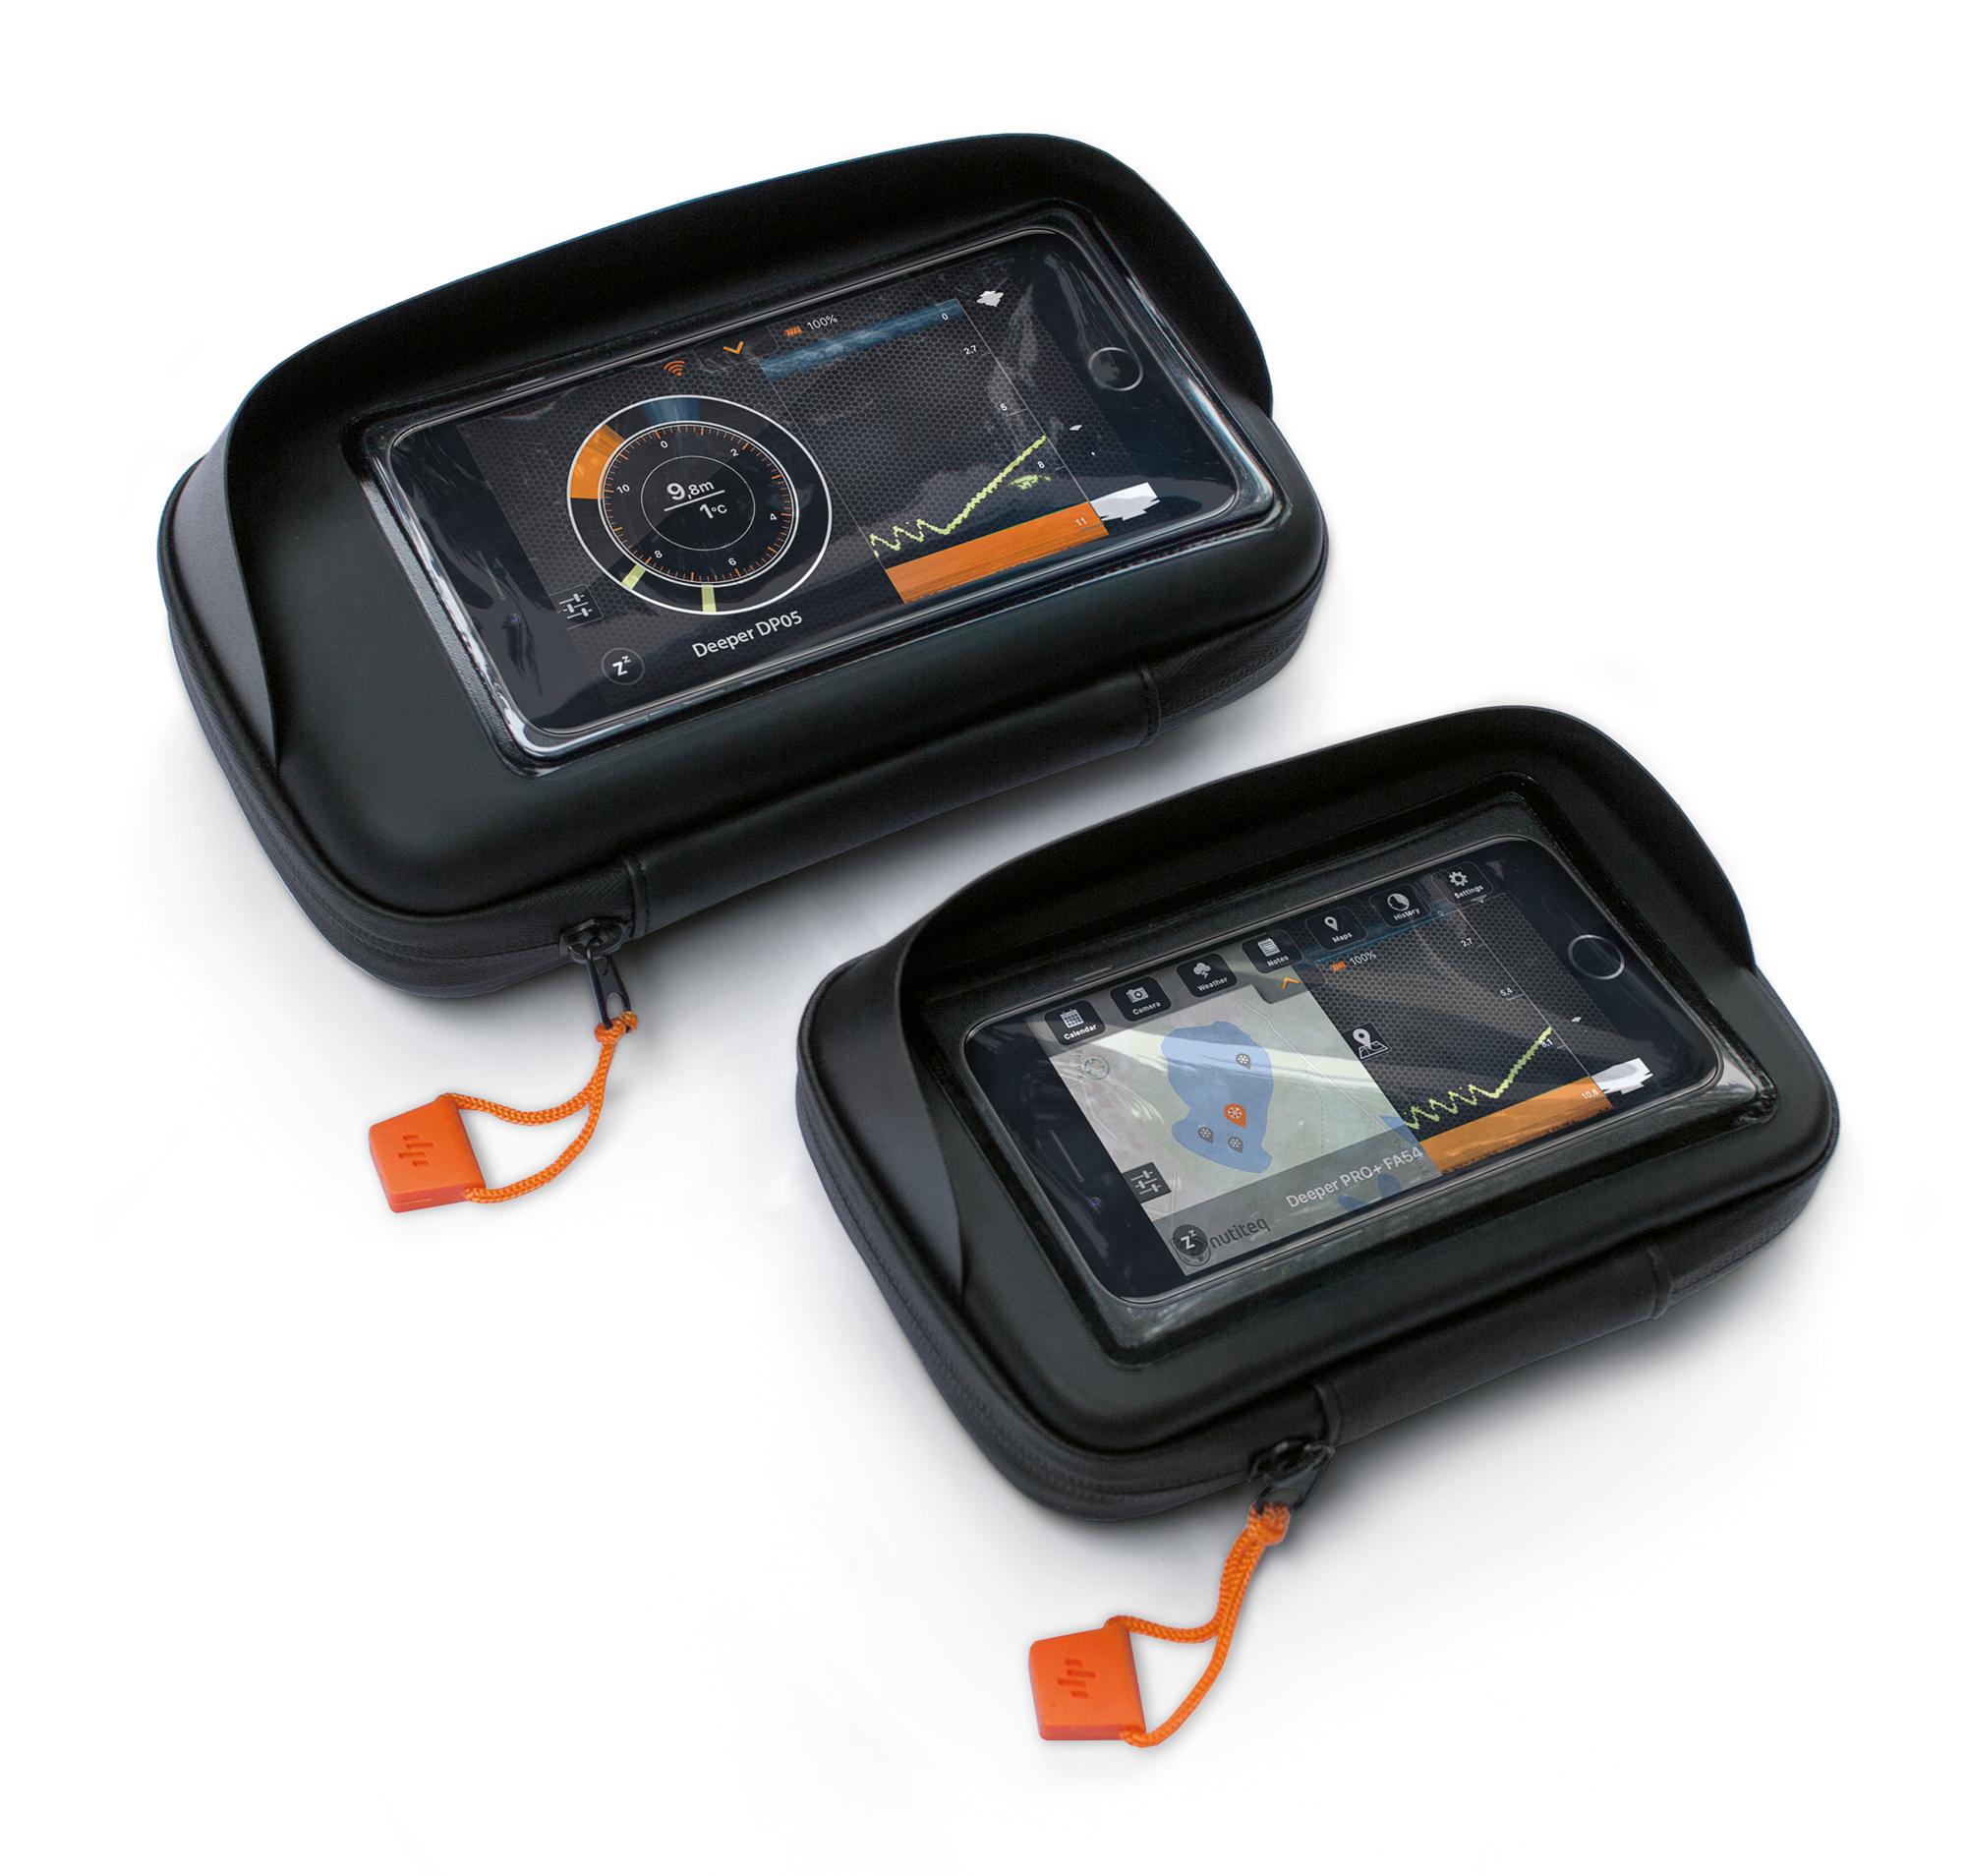 Зимний чехол для смартфонов Deeper (Small) бот для рыбалки archeage